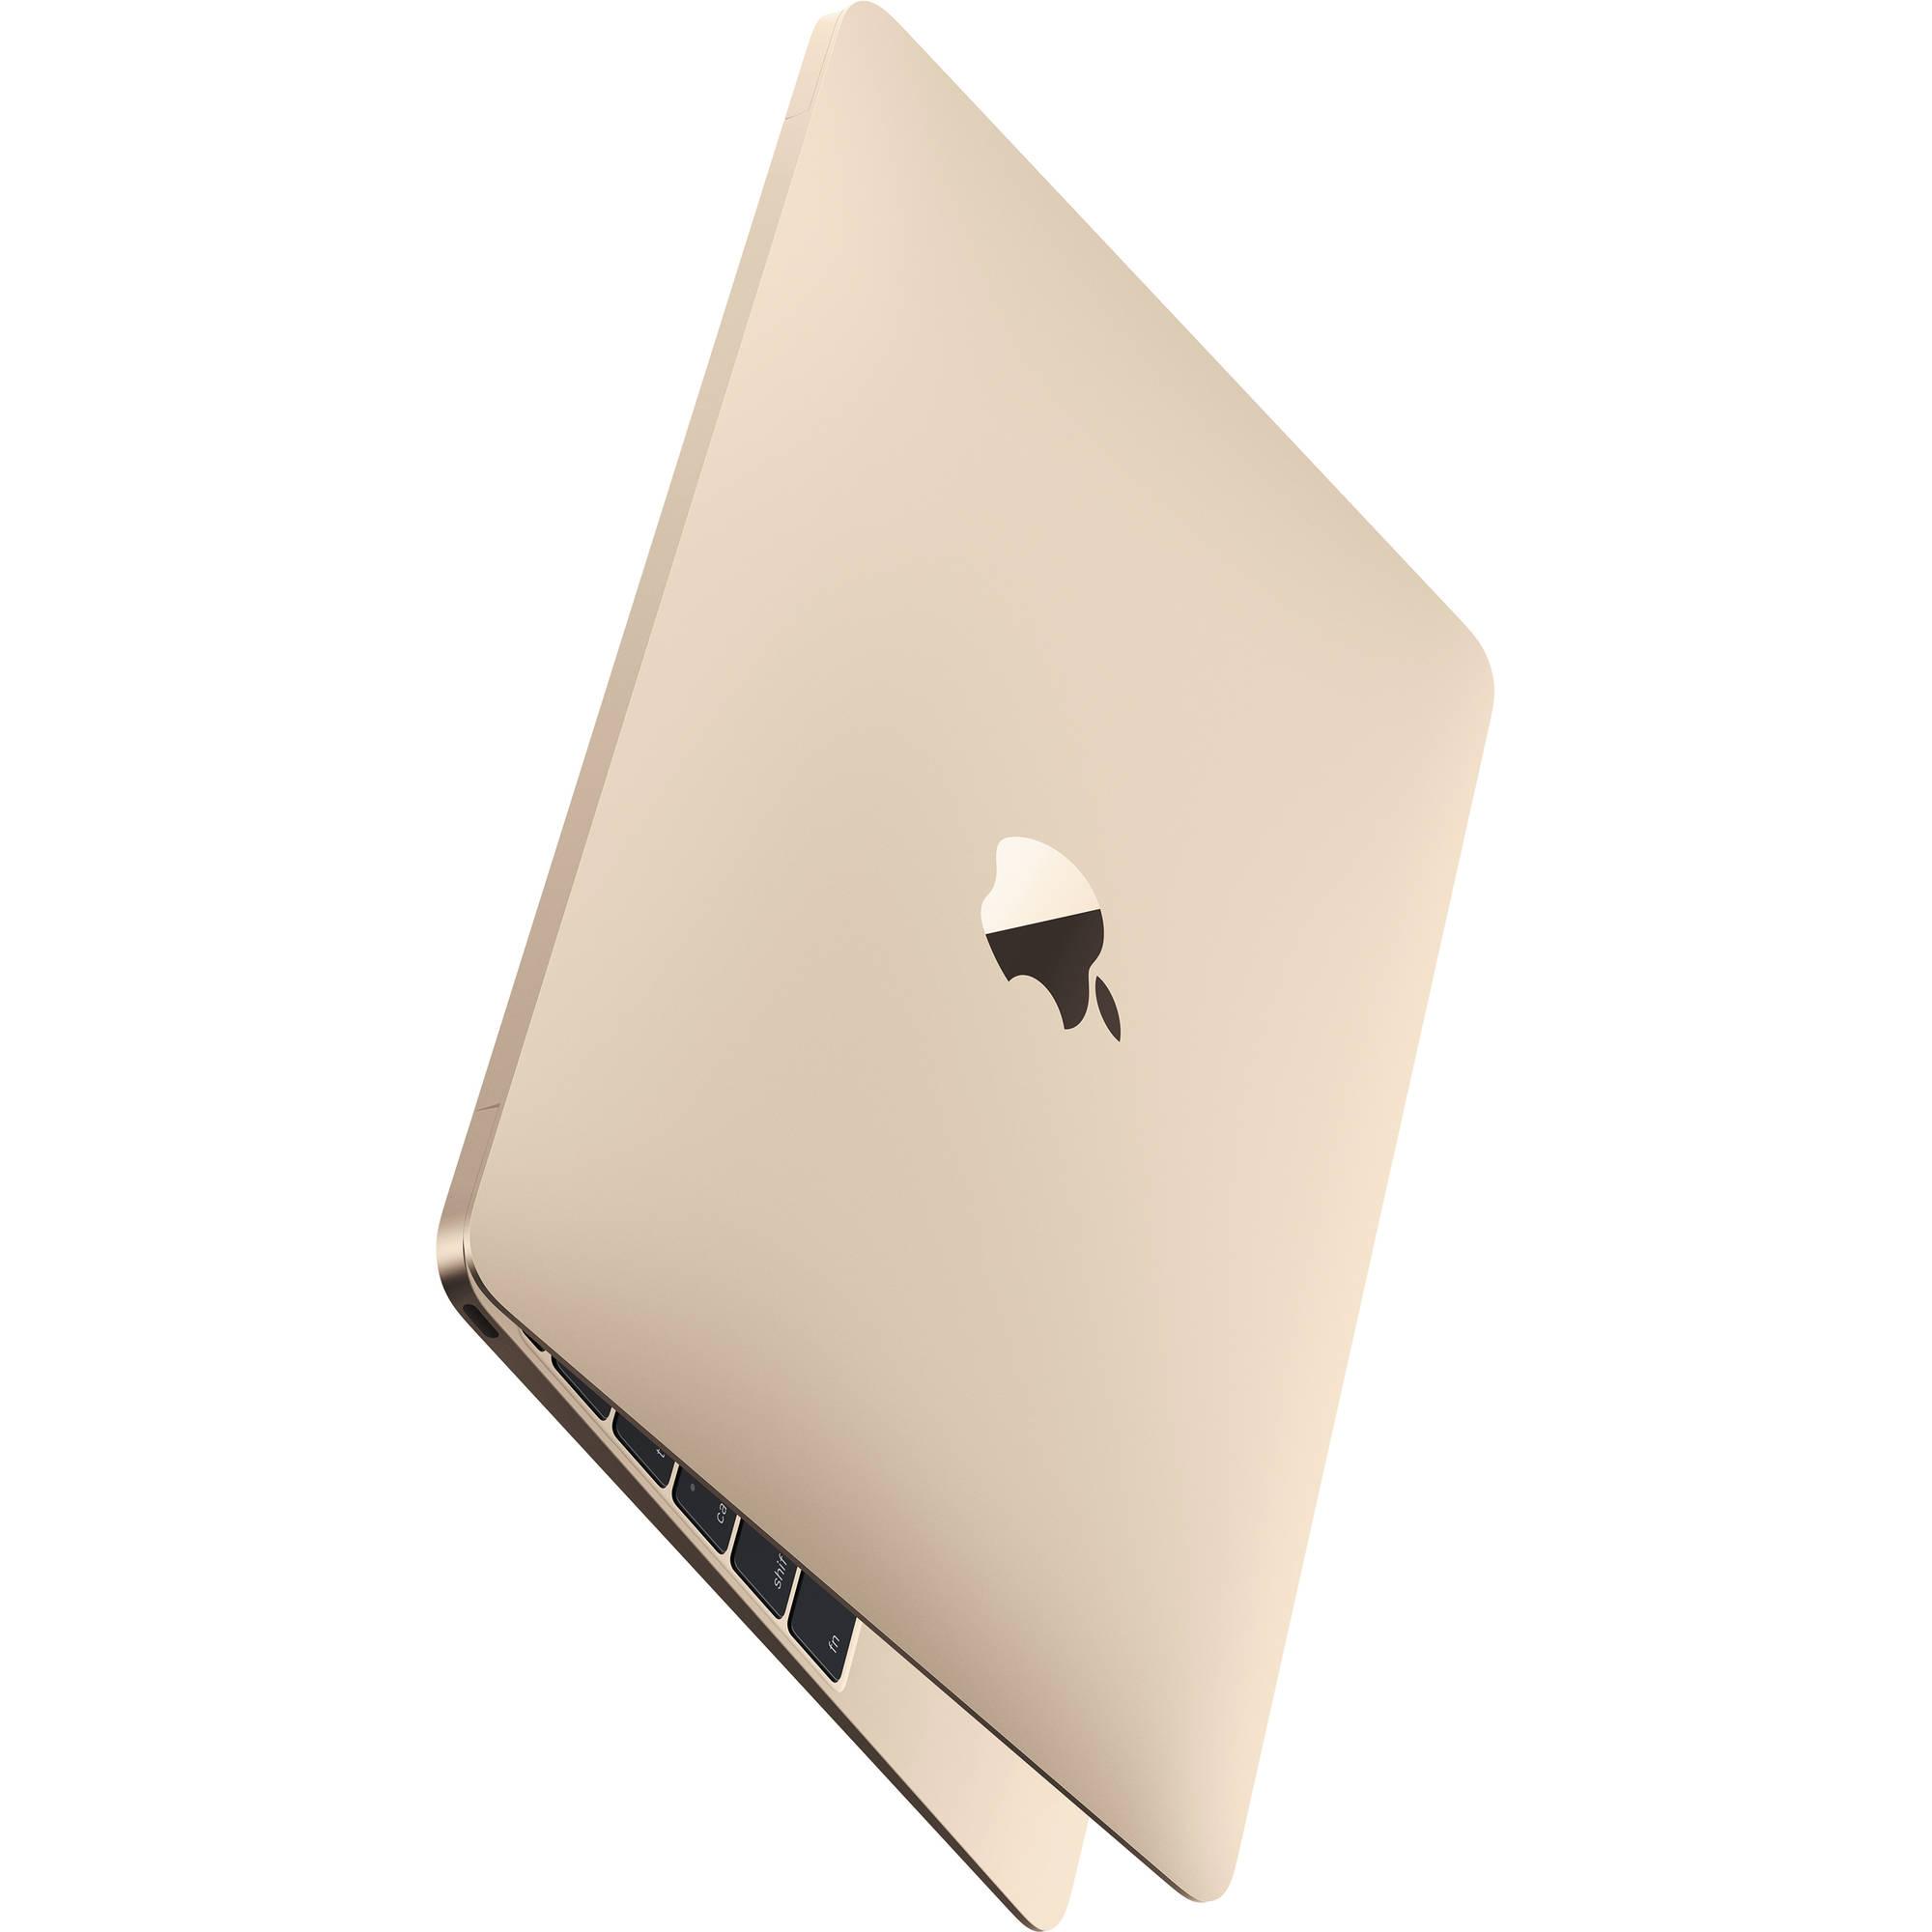 Macbook 12 inch 2015 - 256GB- New 99%